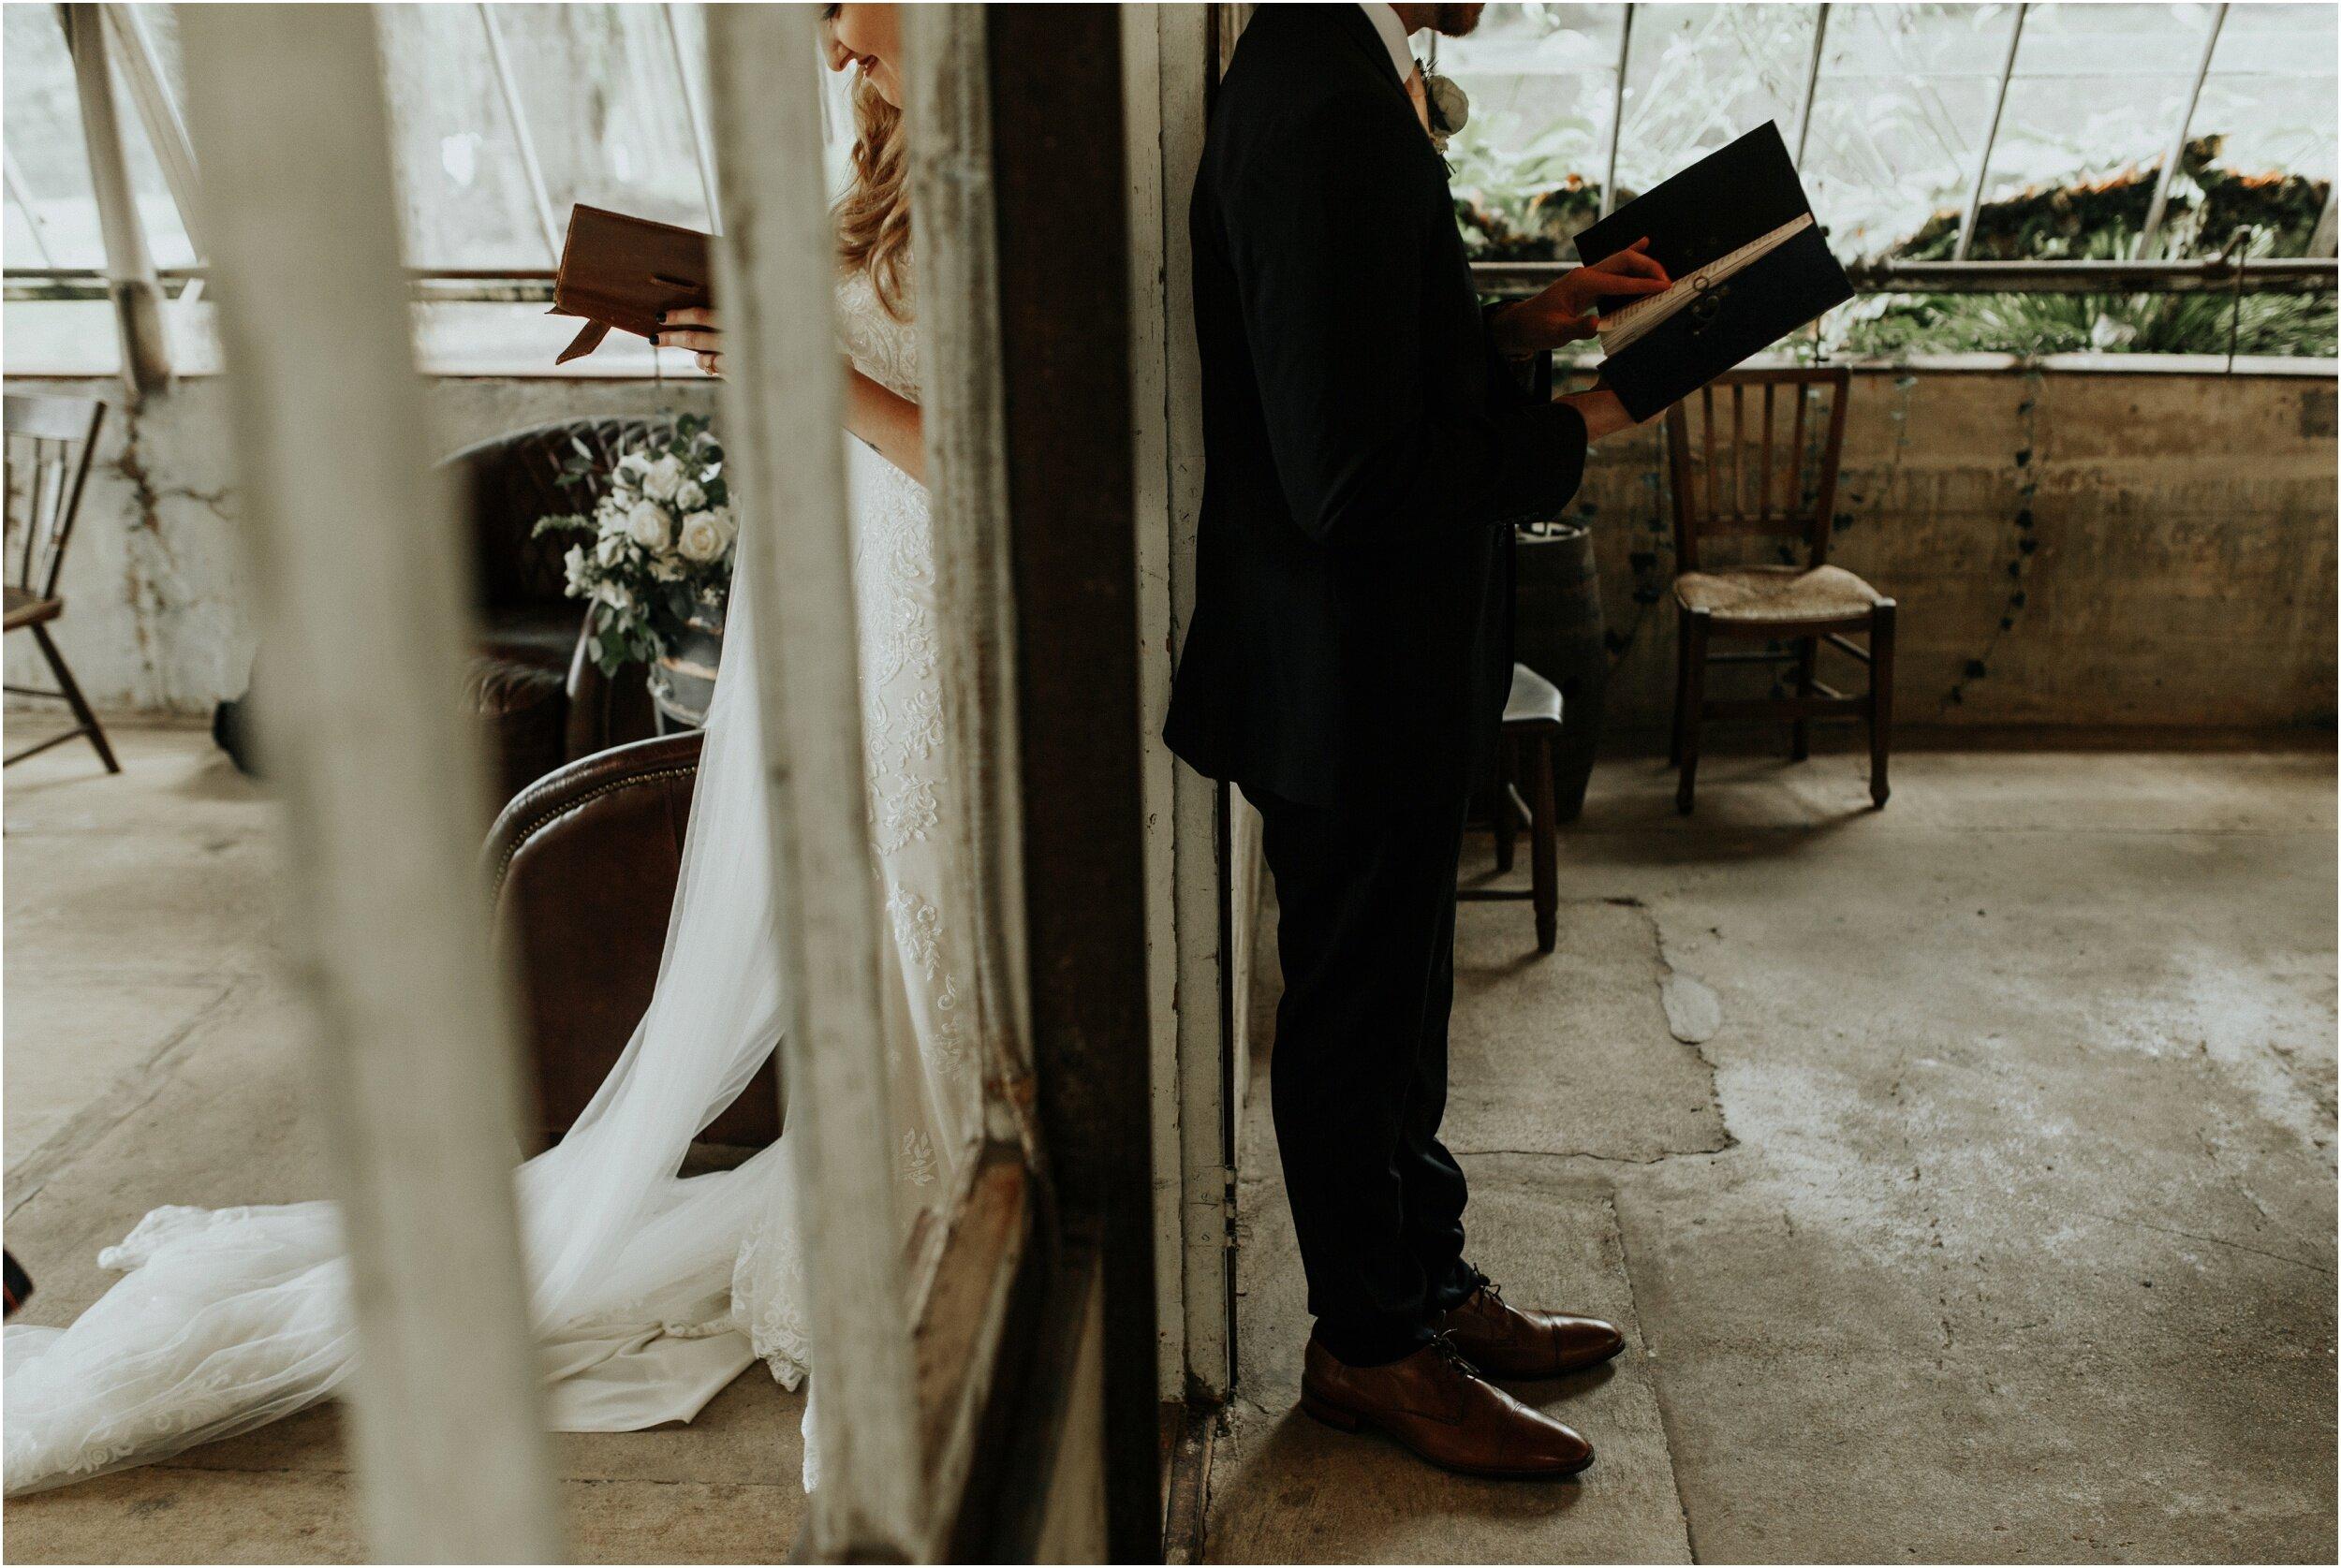 steph-and-jordan-cox-our-wedding-historic-shady-lane-compass-wedding-collective-hazel-lining-photography-destination-elopement-wedding-engagement-photography_0030.jpg